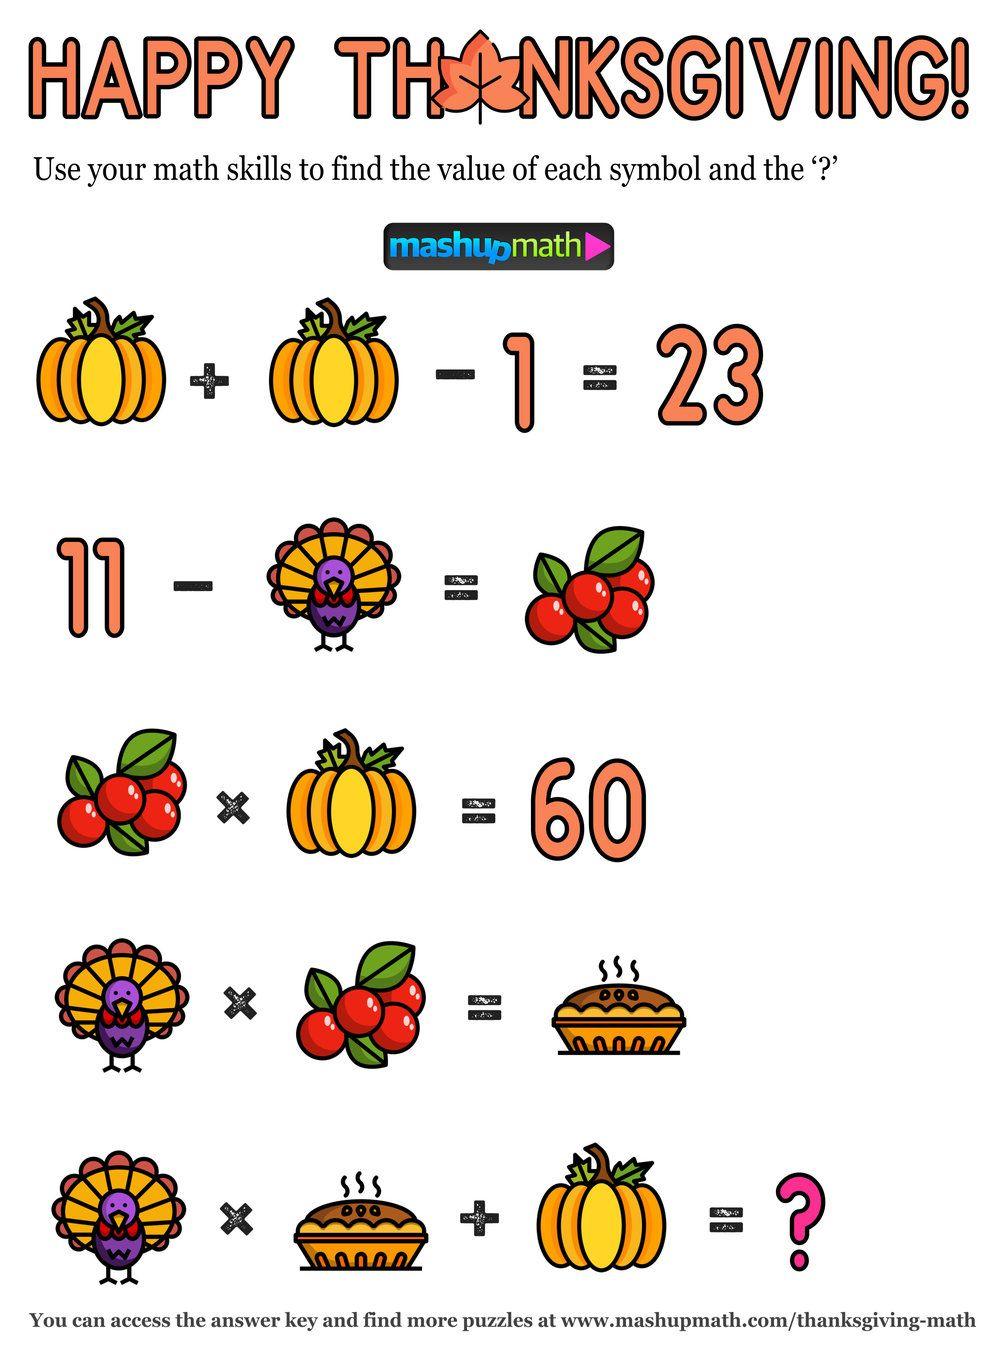 12 Thanksgiving Math Activities For Grades 1 8 Mashup Math Thanksgiving Math Worksheets Thanksgiving Math Thanksgiving Math Activities